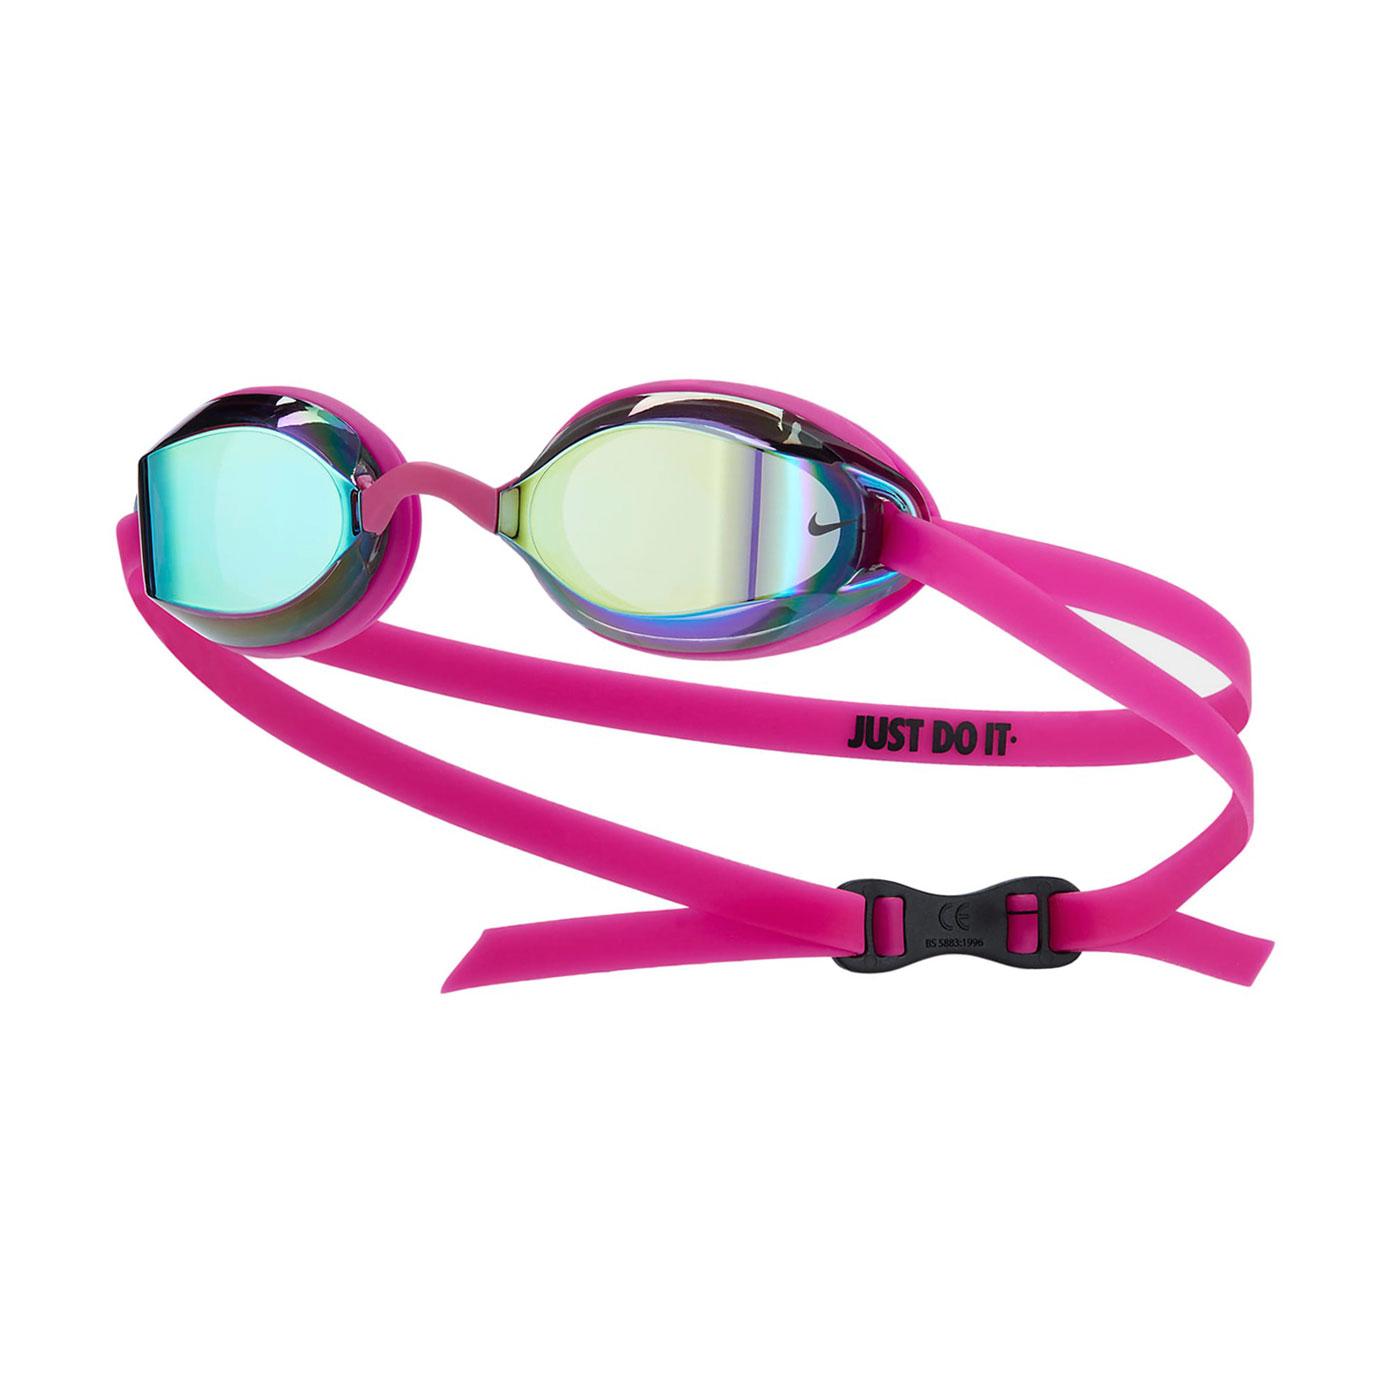 NIKE SWIM 成人專業型鏡面泳鏡 NESSA178-710 - 桃紅